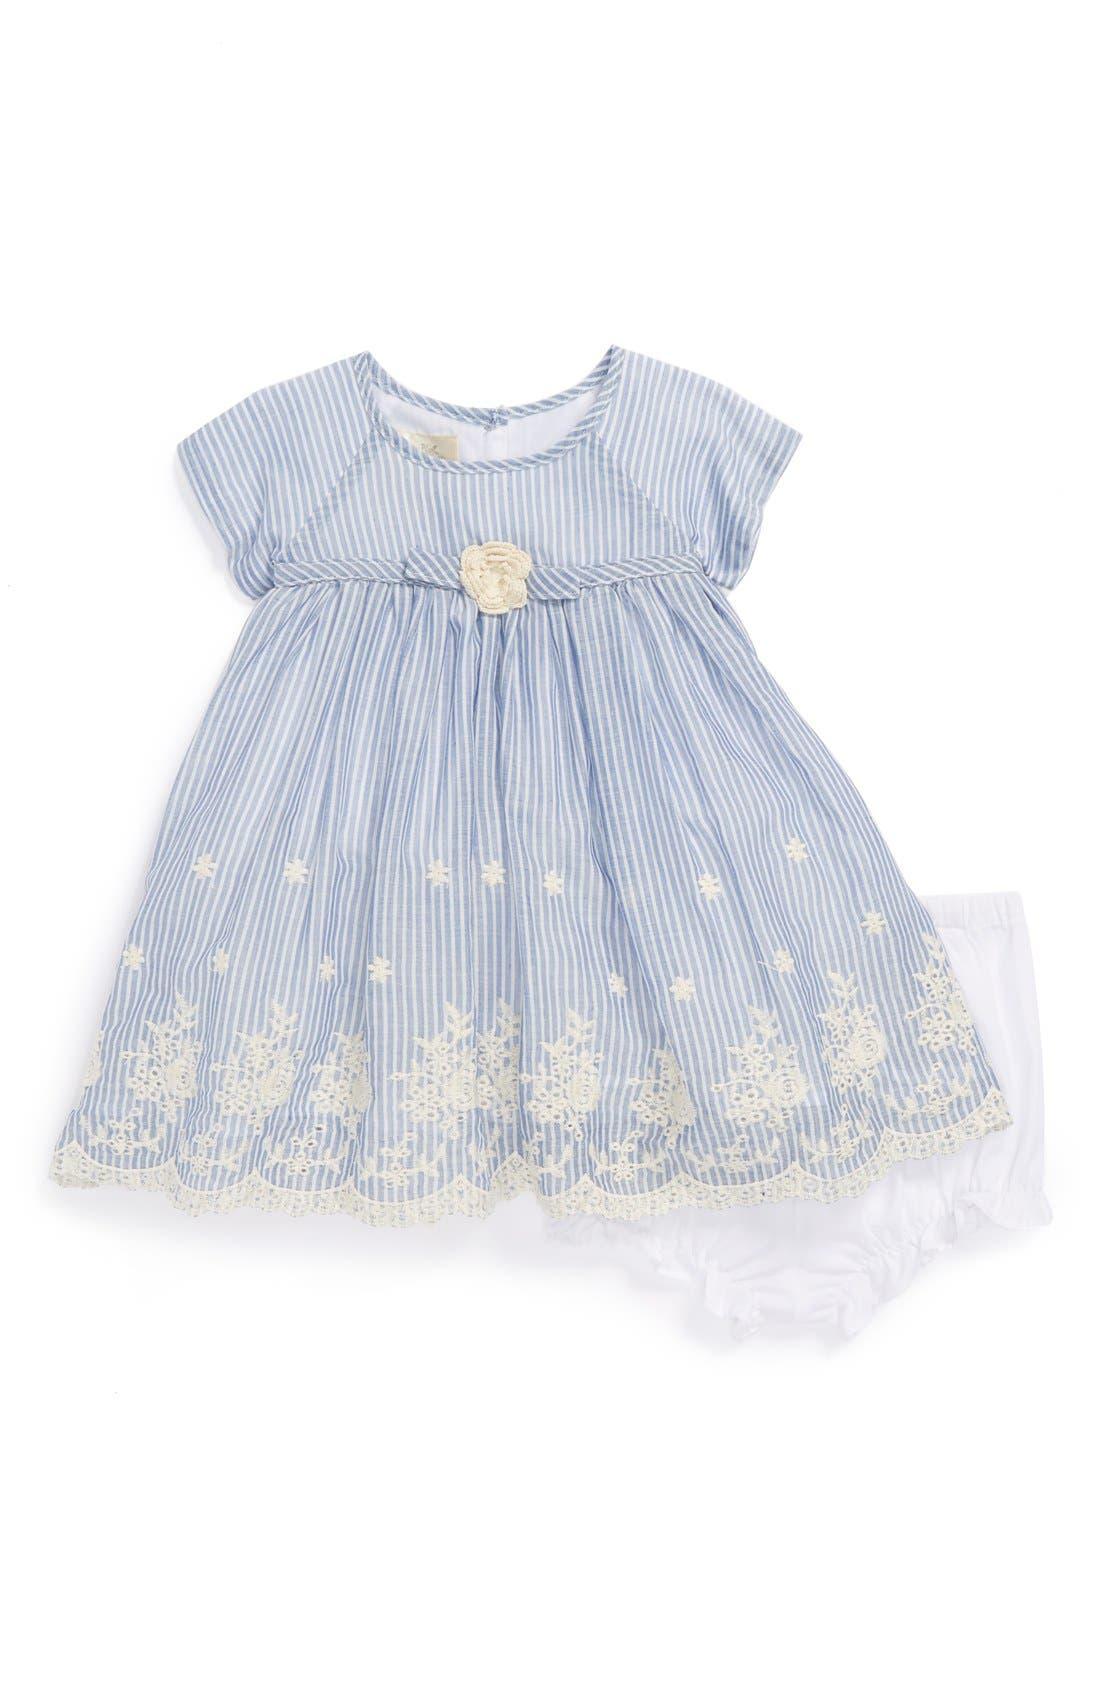 Main Image - Pippa & Julie Chambray & Eyelet Dress & Bloomers (Baby Girls)